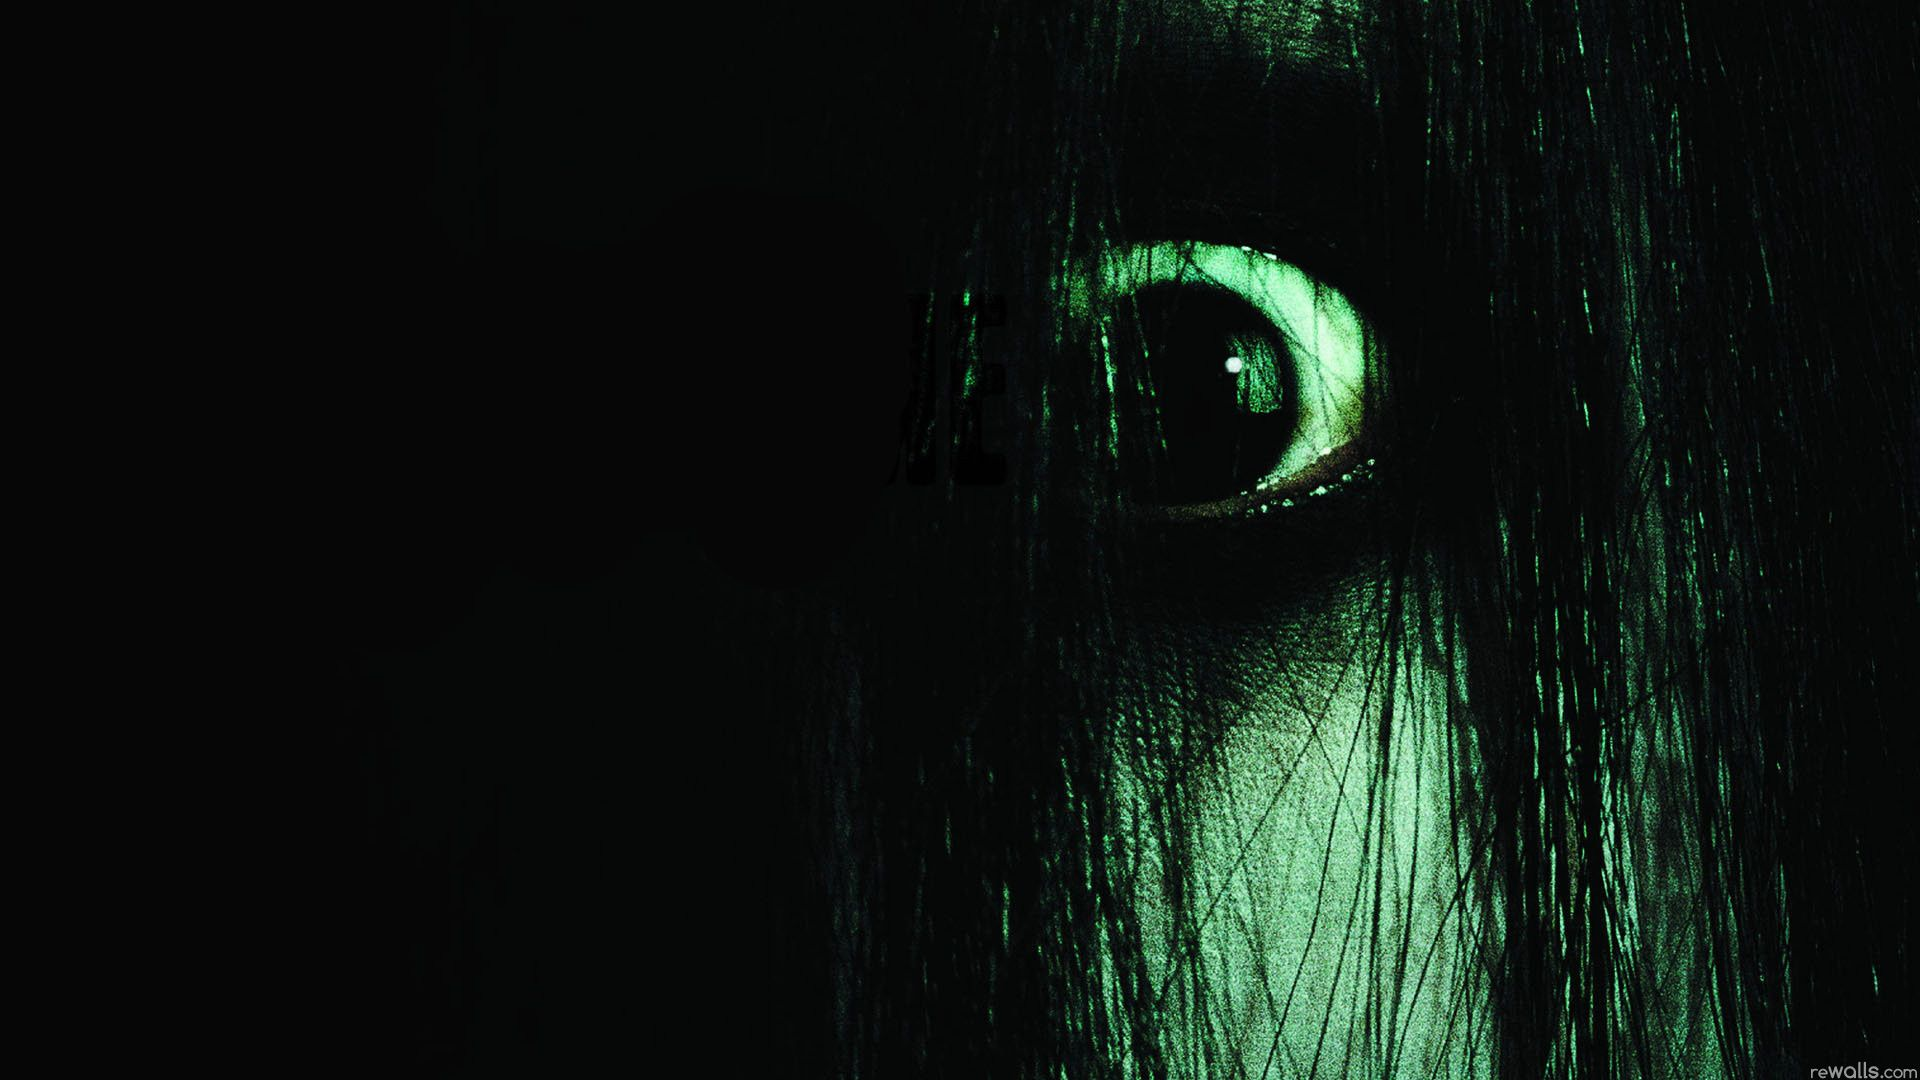 Creepy Hd Wallpaper: Scary HD Wallpapers 1080p